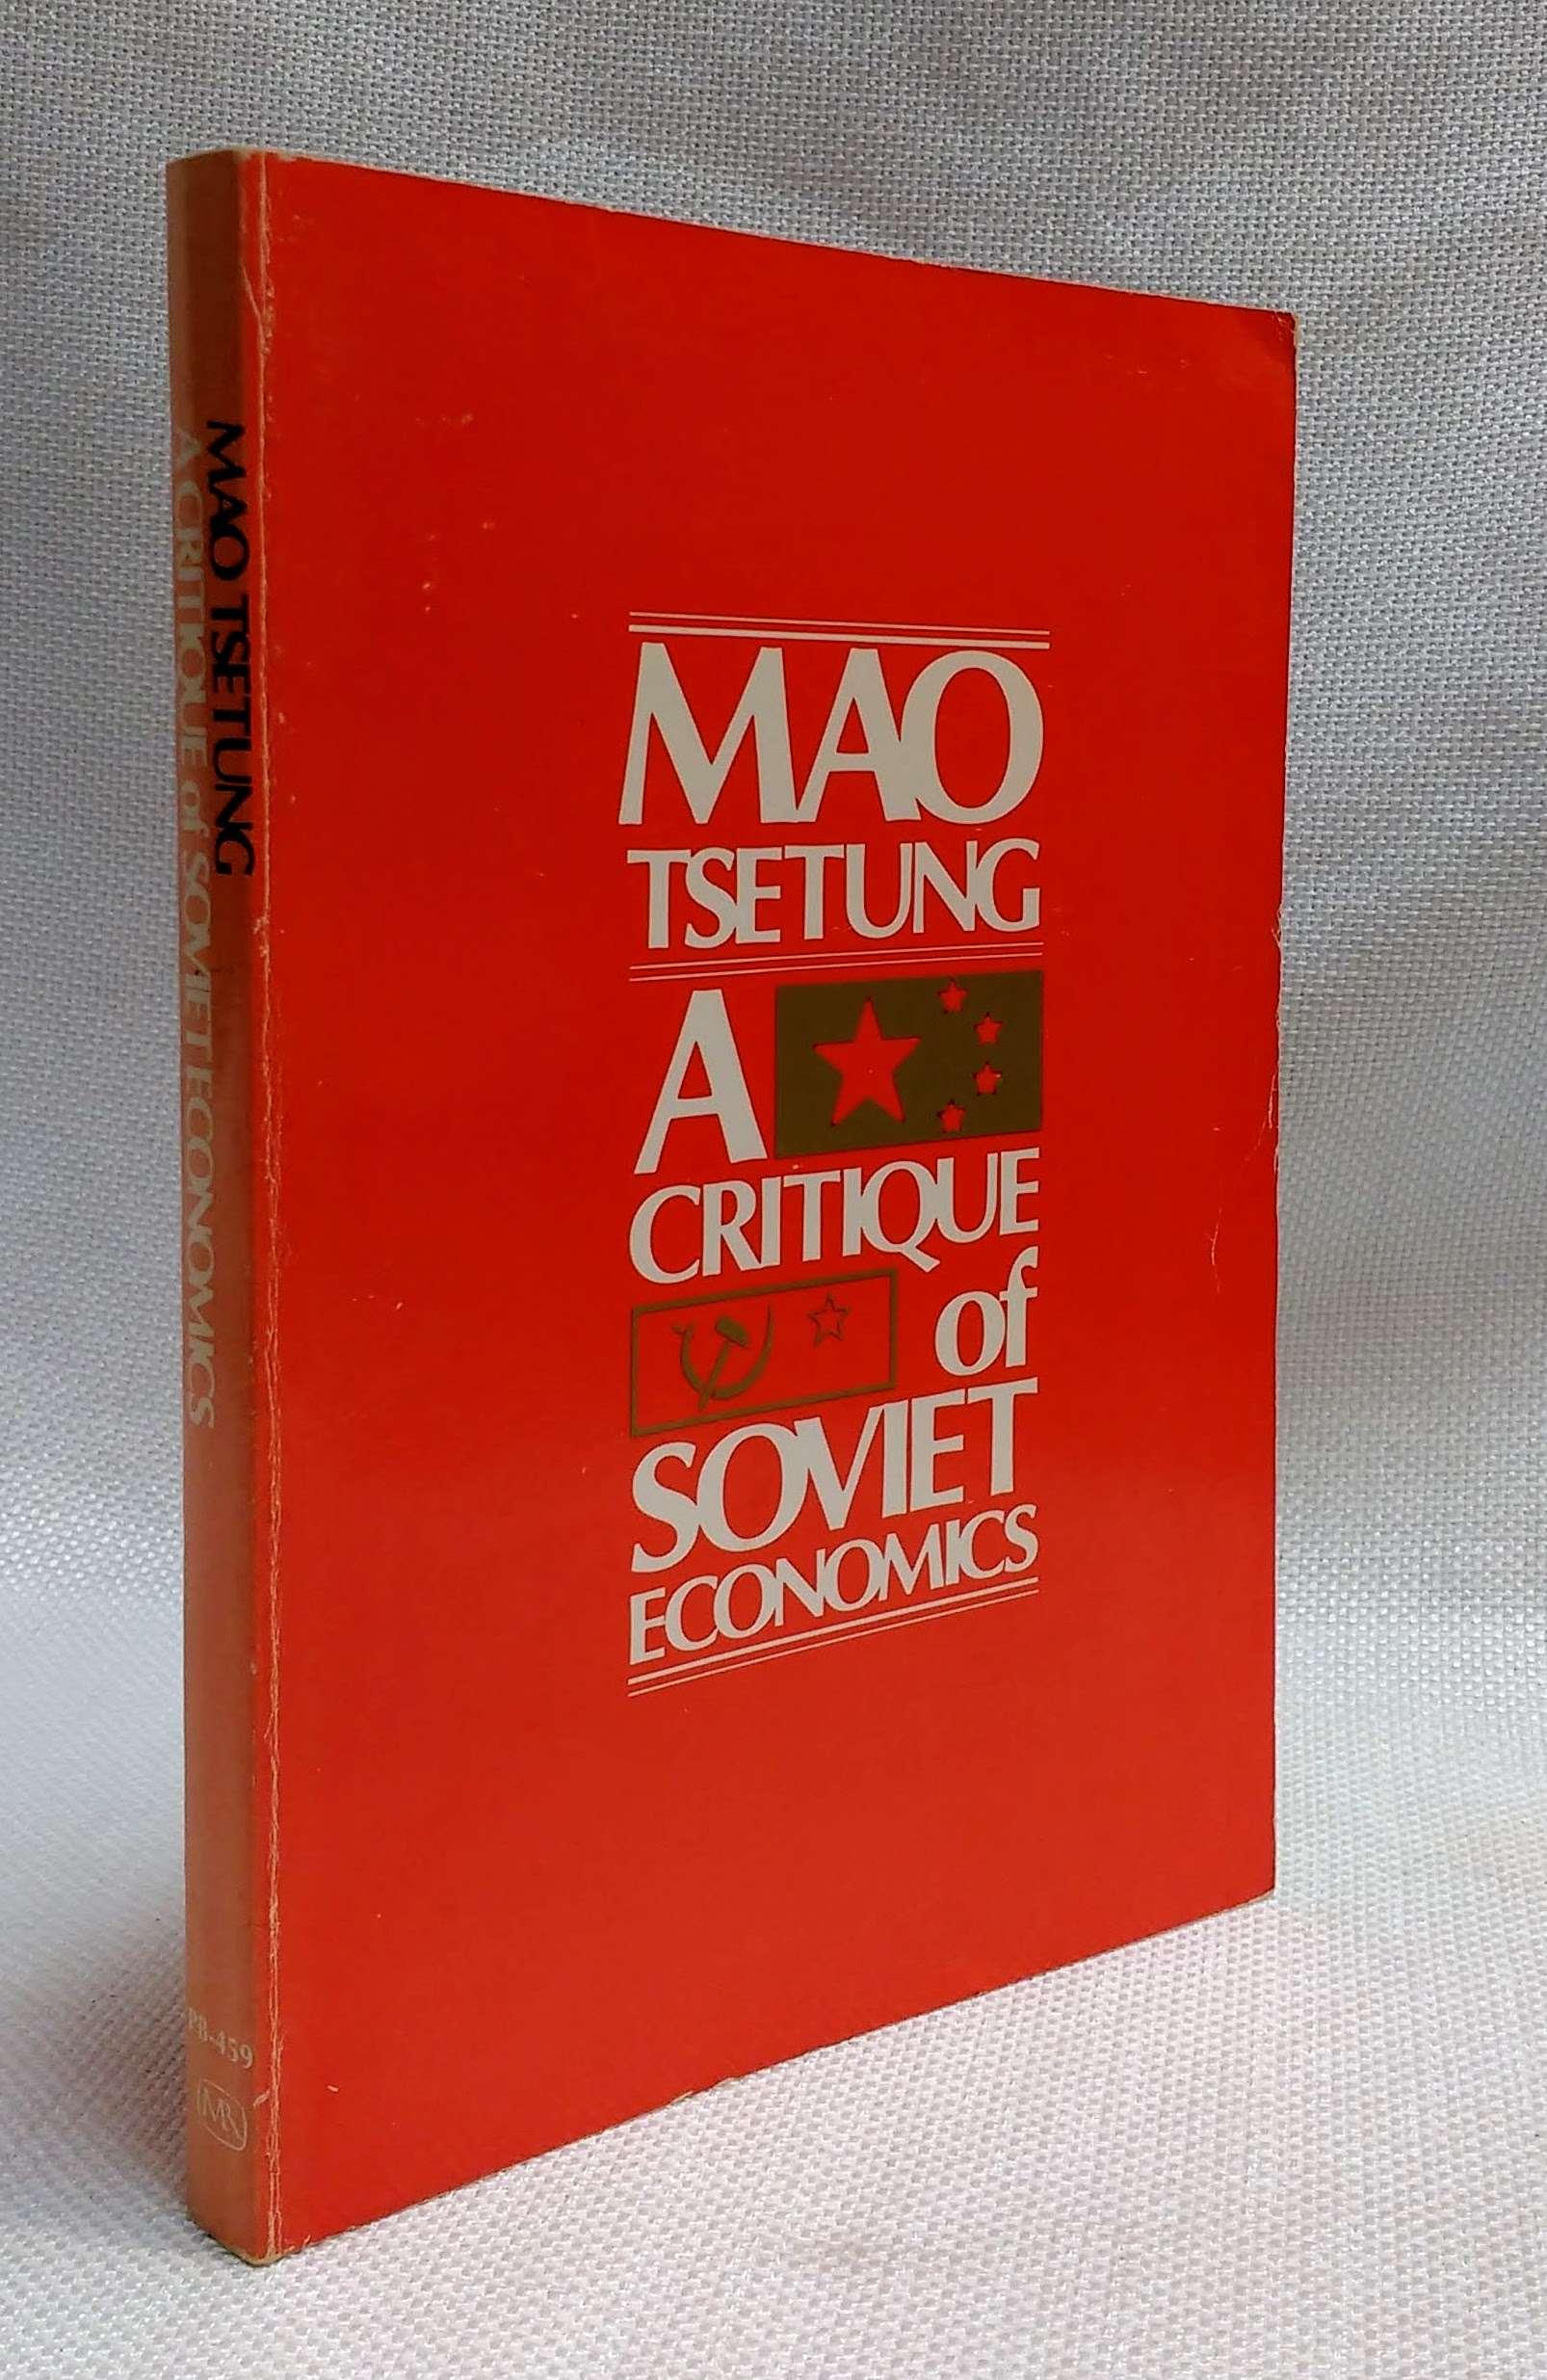 Critique of Soviet Economy, Tse-Tung, Mao; Roberts, Moss [tr.]